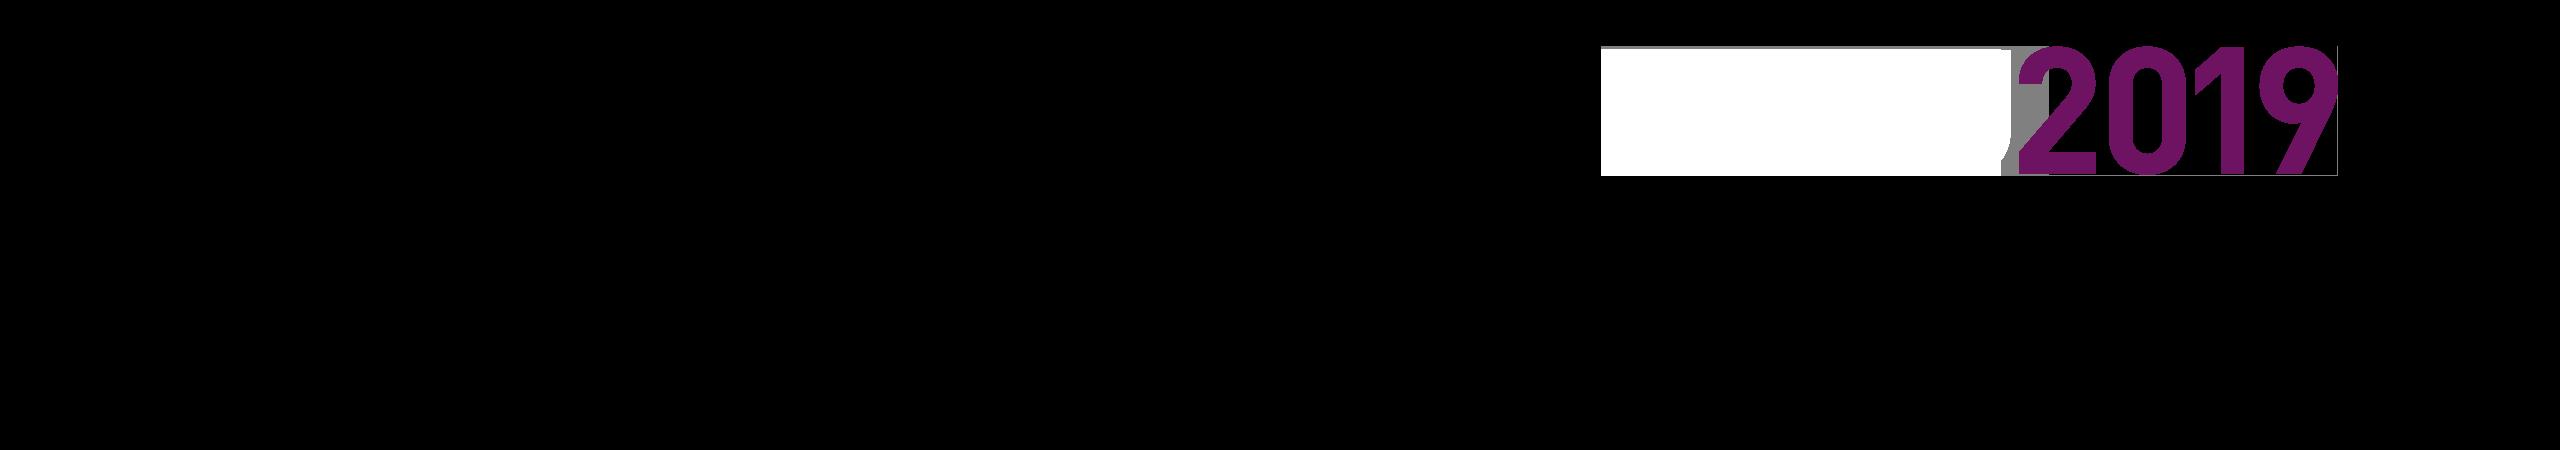 DKOU2019 Start Logo